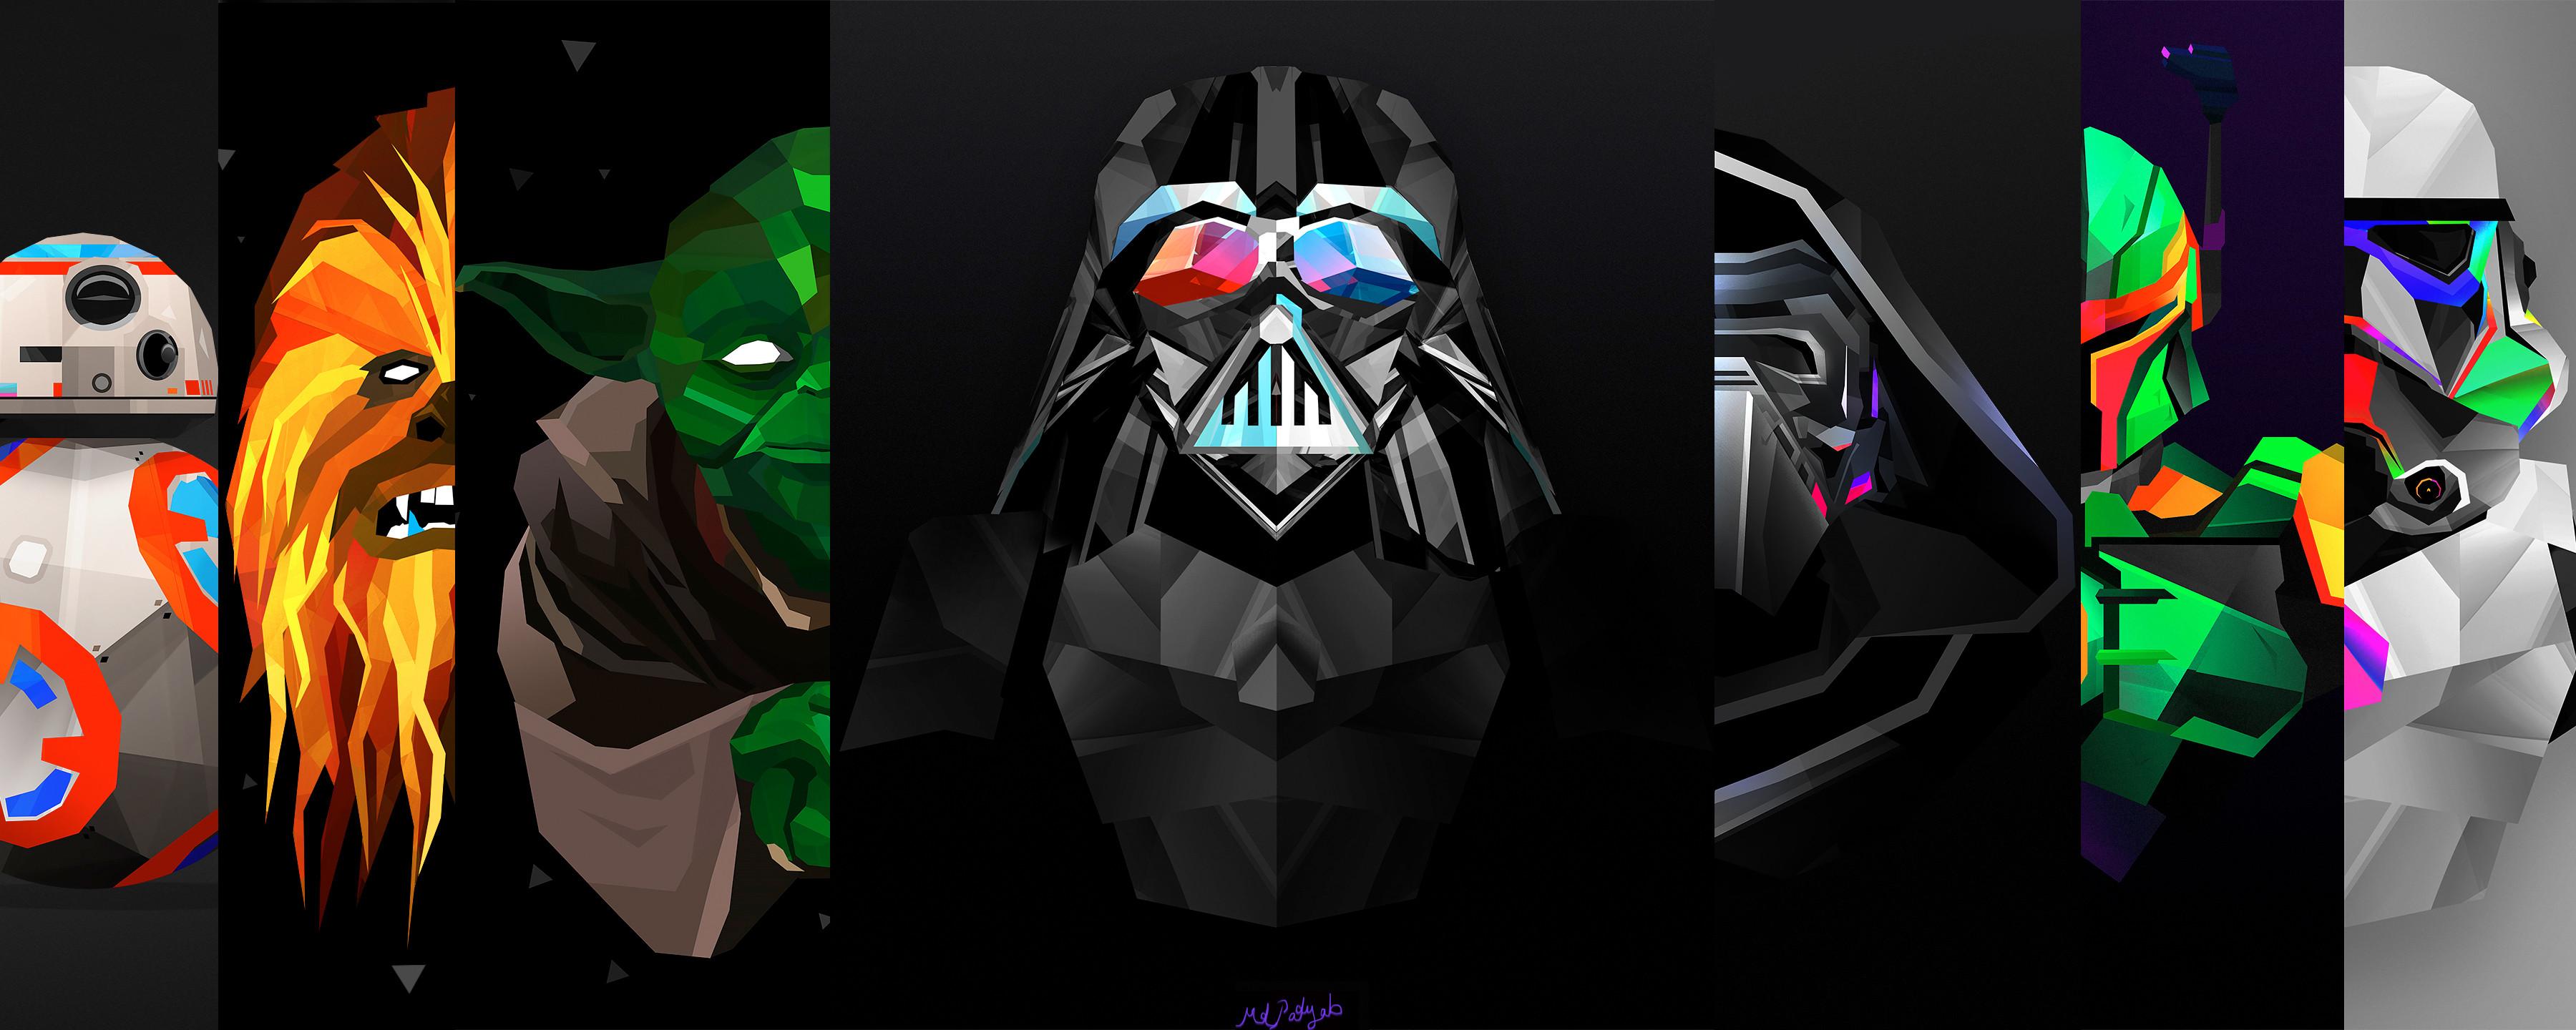 Movie – Star Wars Episode VII: The Force Awakens Darth Vader Stormtrooper  Yoda BB-